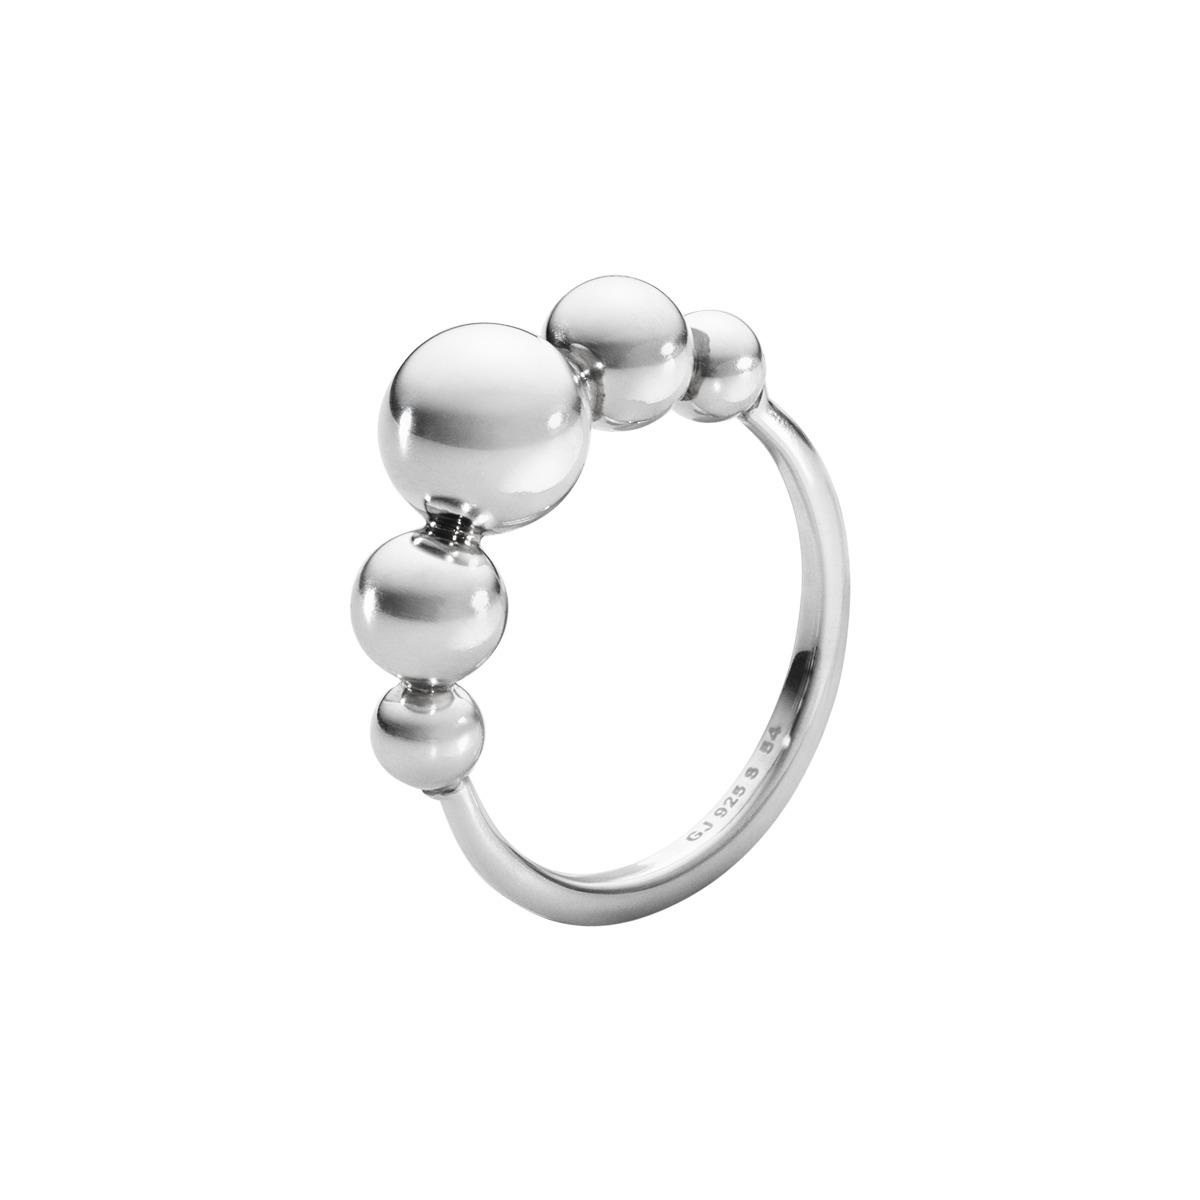 Georg Jensen MOONLIGHT GRAPES ring - 3560980 Sølv 56